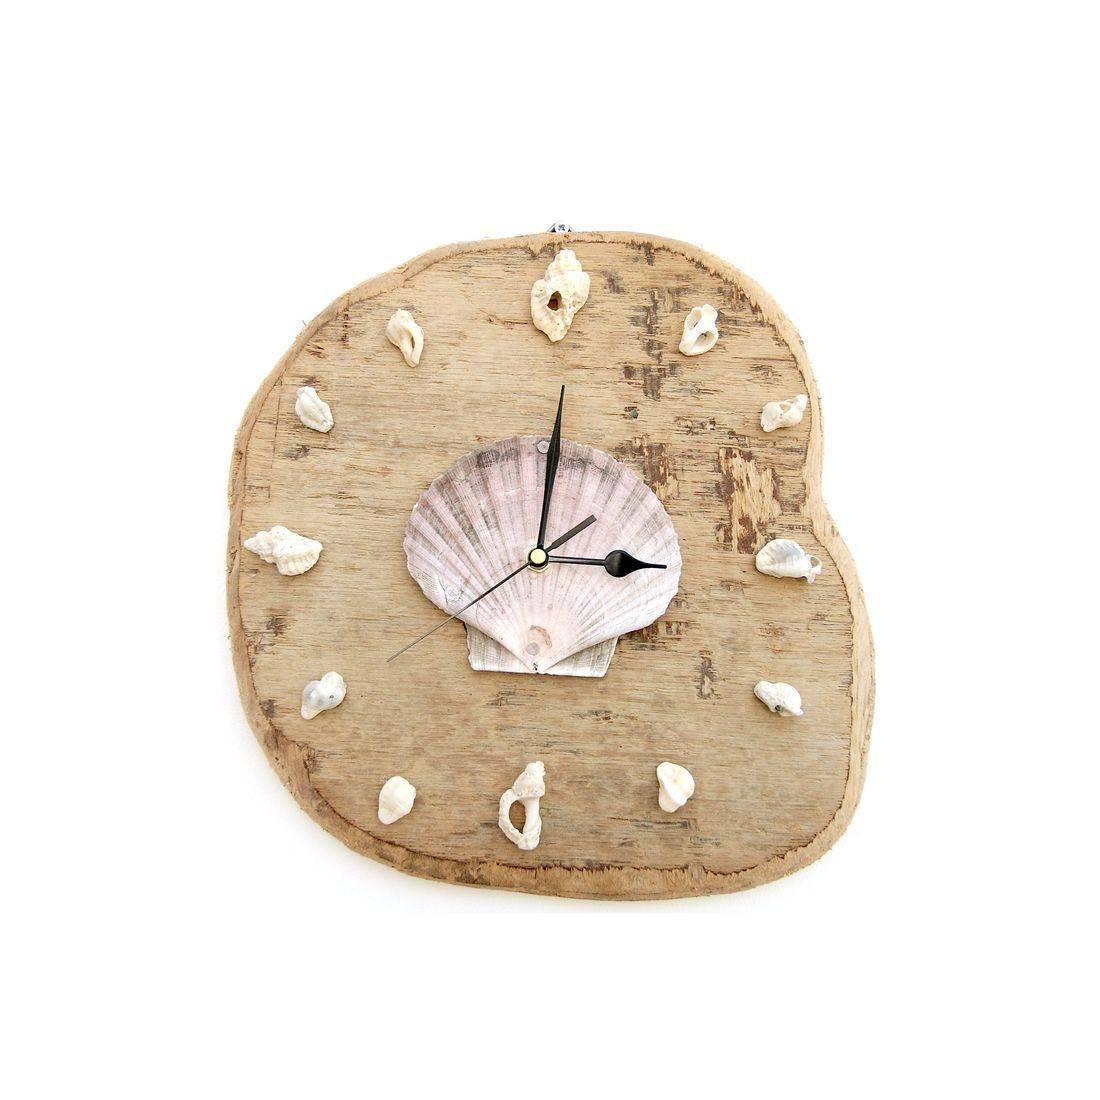 Driftwood Clock 7